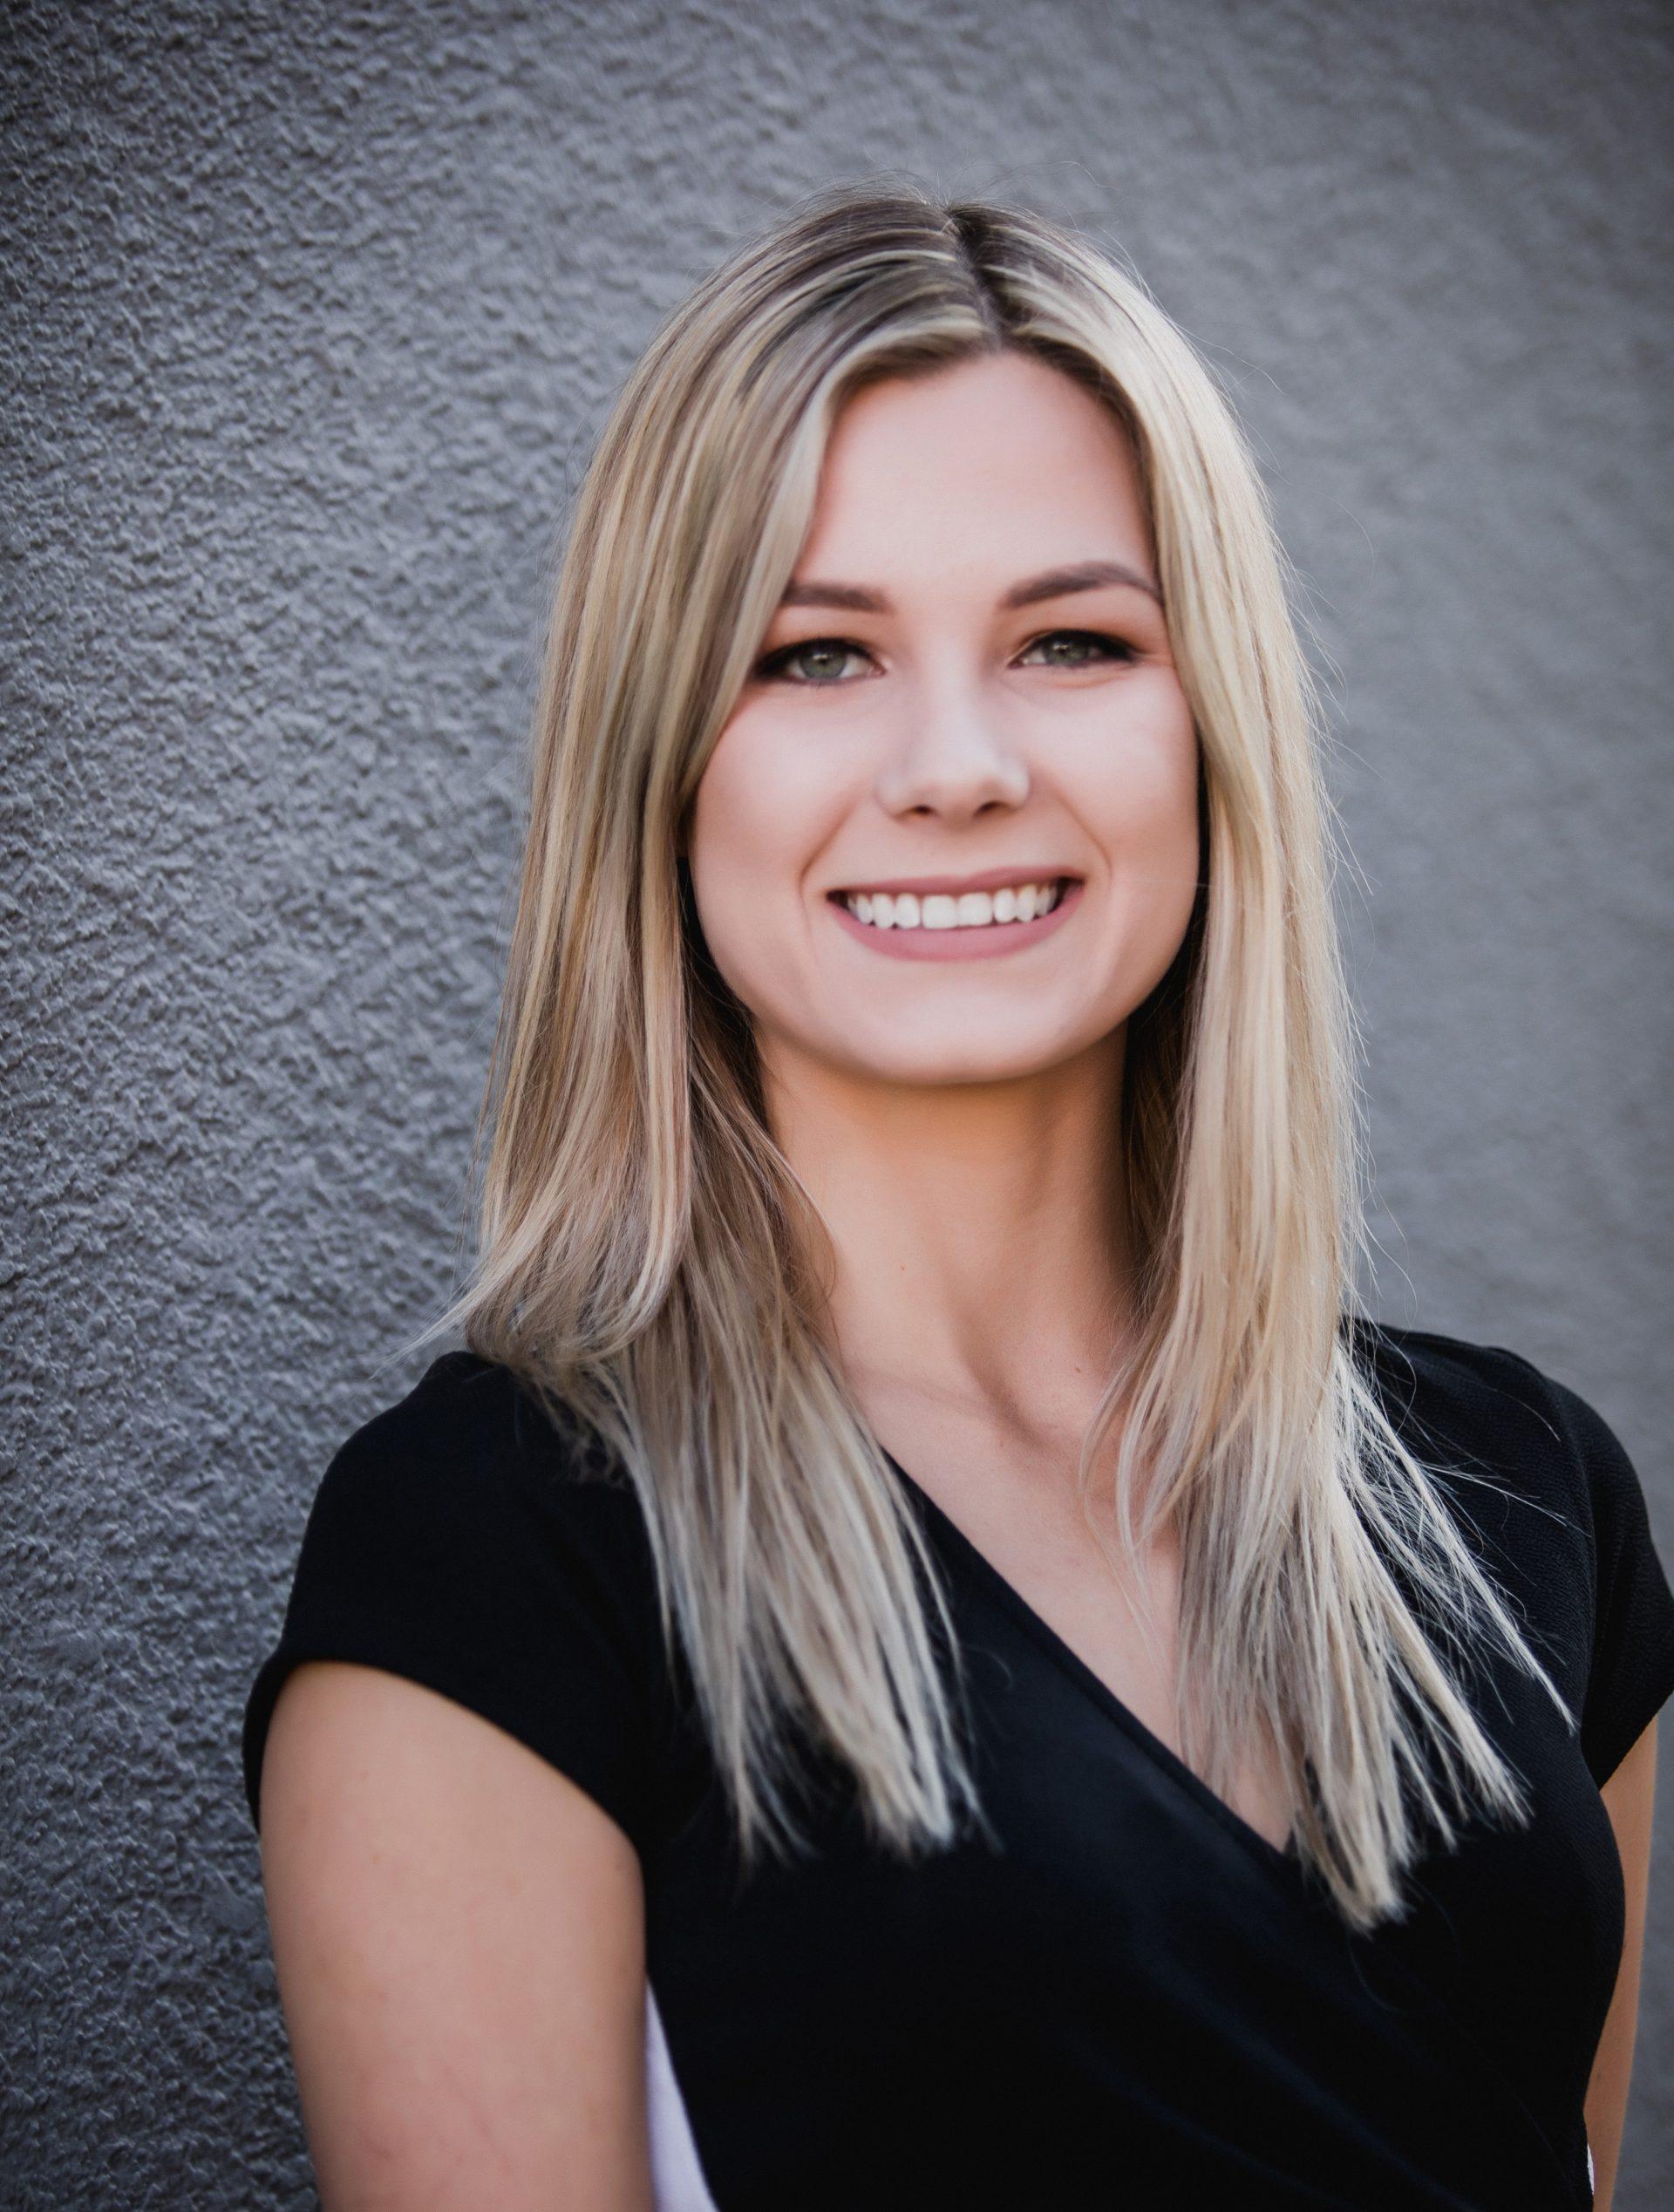 Amanda Mosby